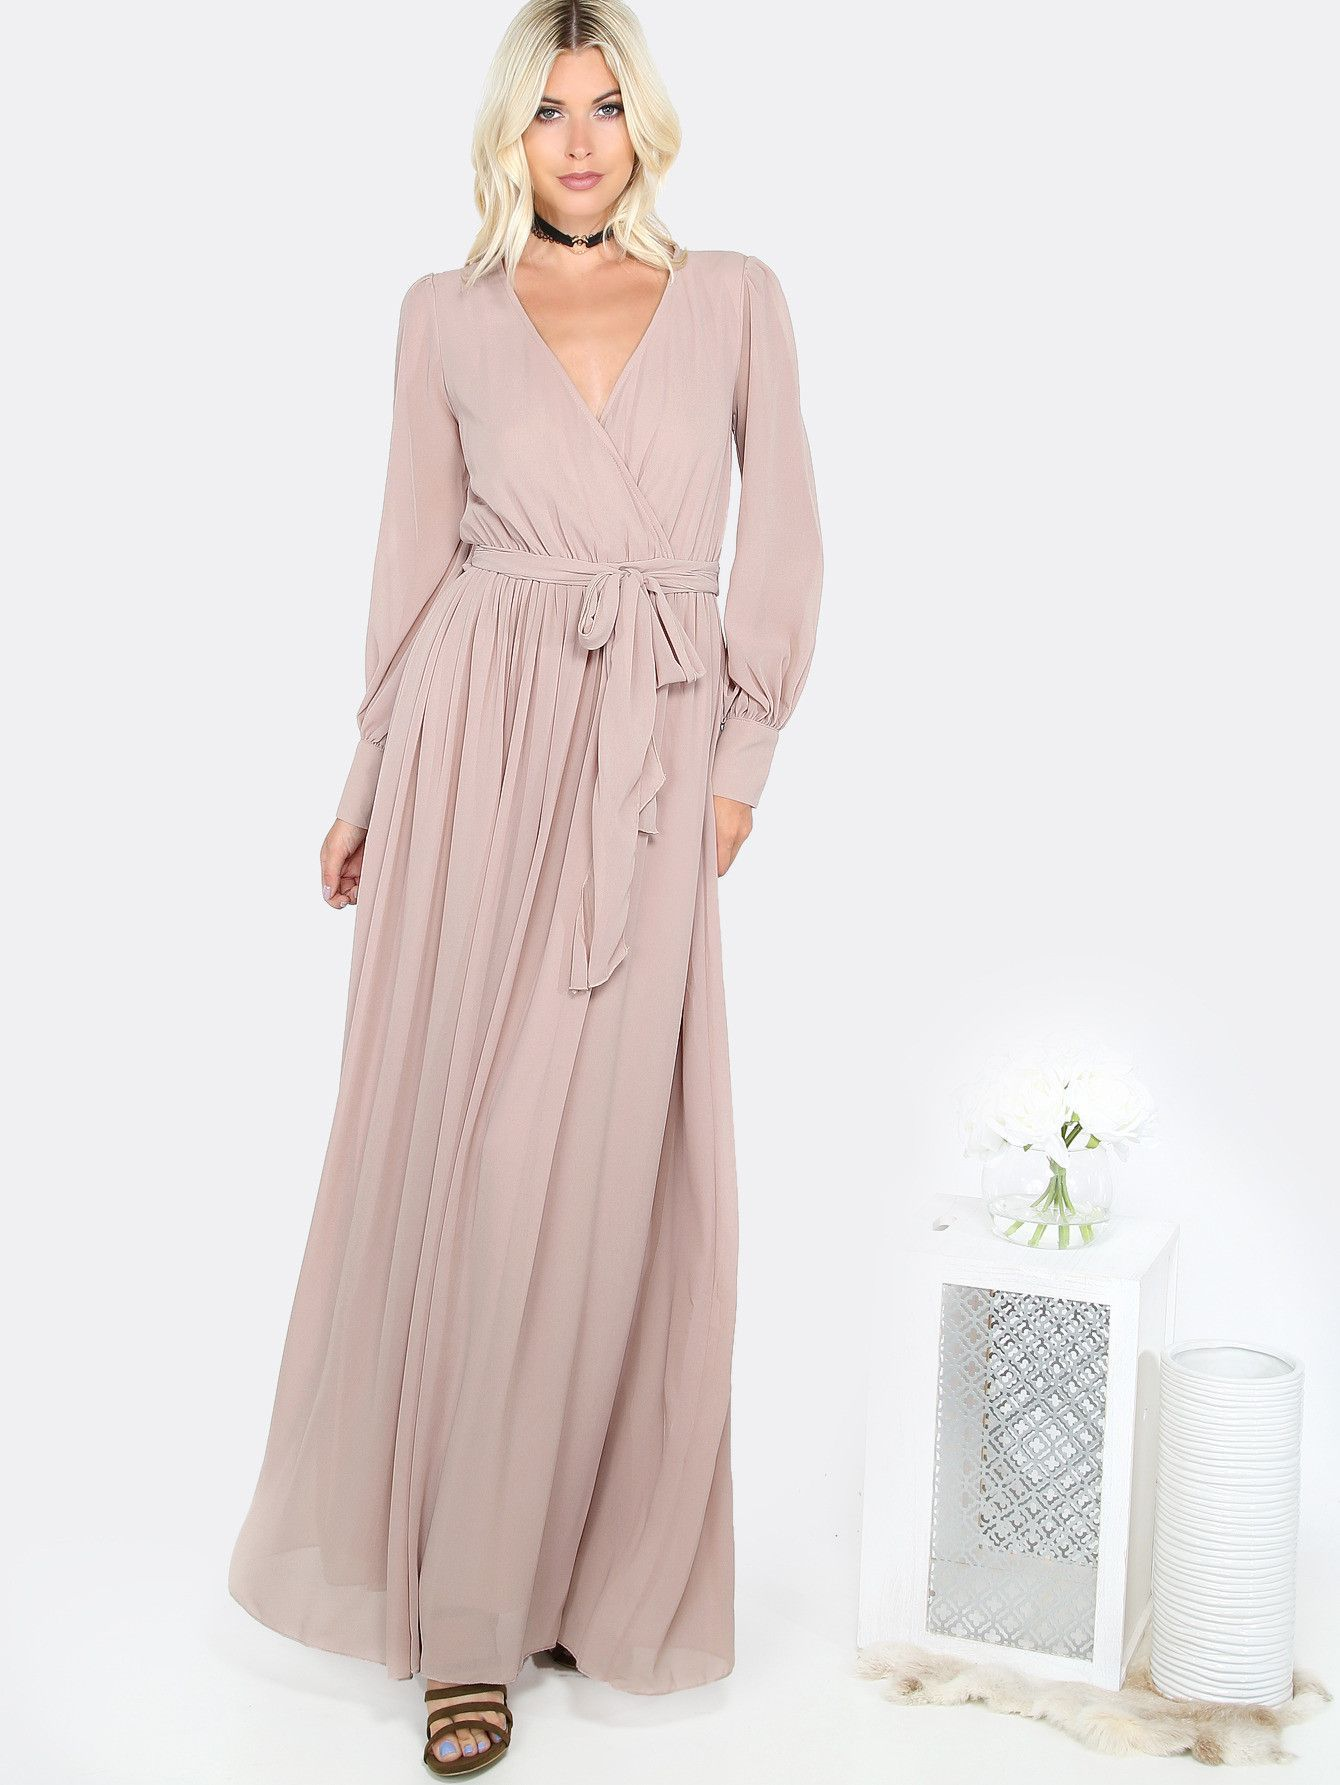 Khaki v neck long sleeve long dress products pinterest fall